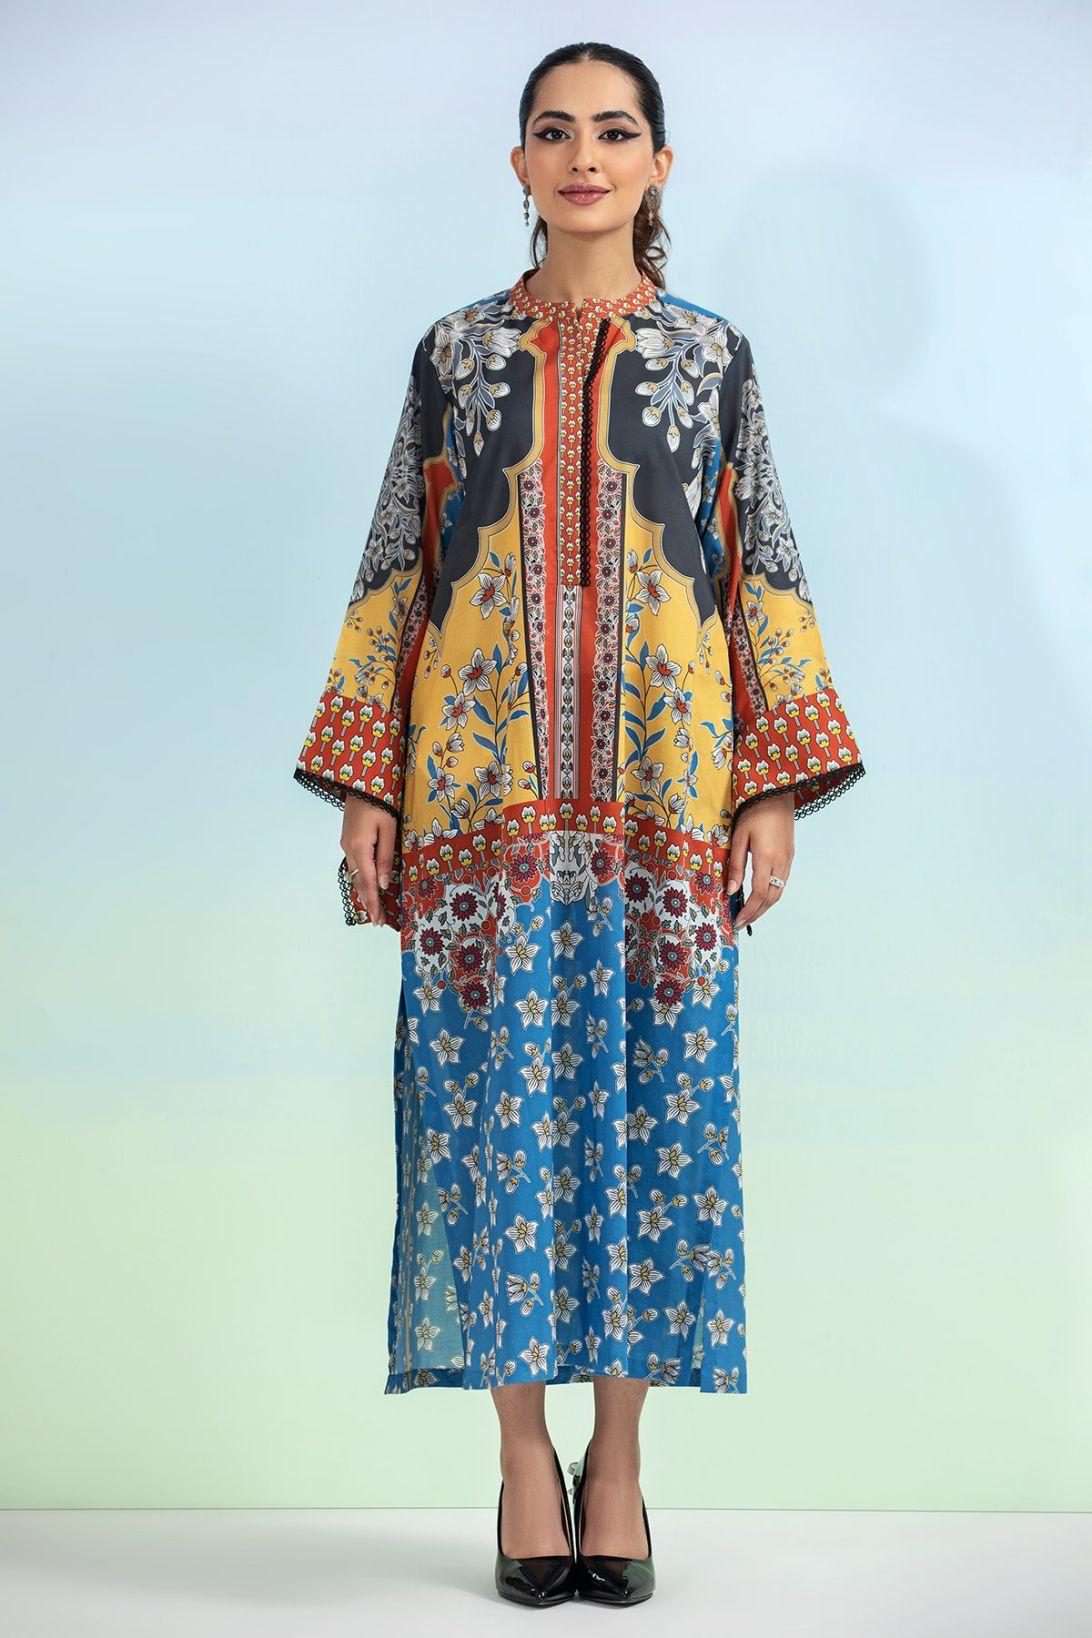 Eid Festive Kurtas & Shirts Designs